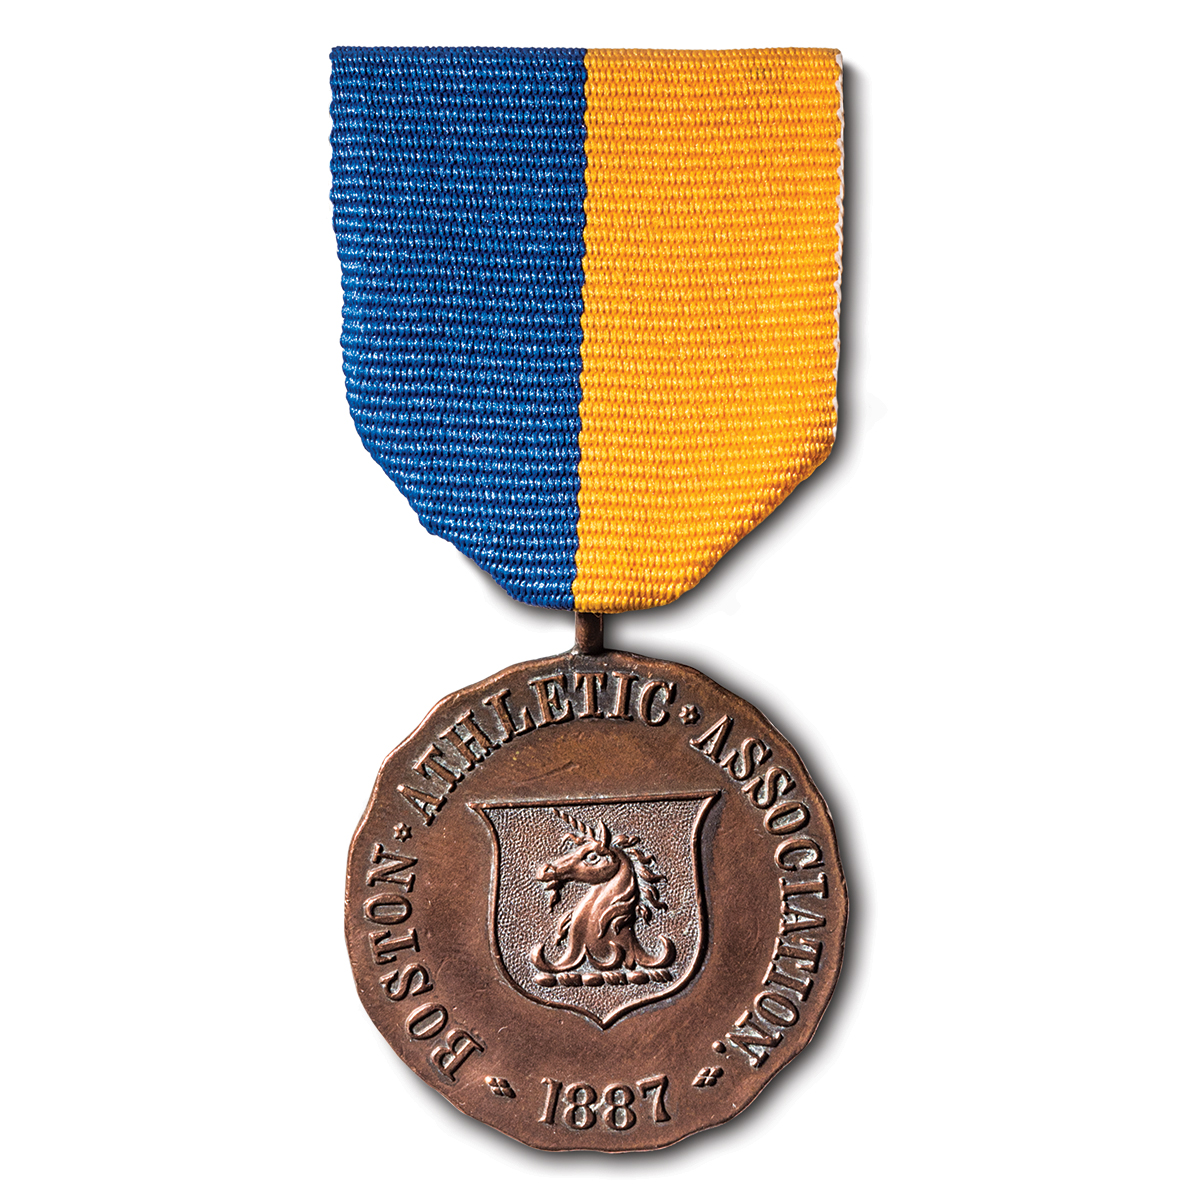 first-boston-marathon-medal